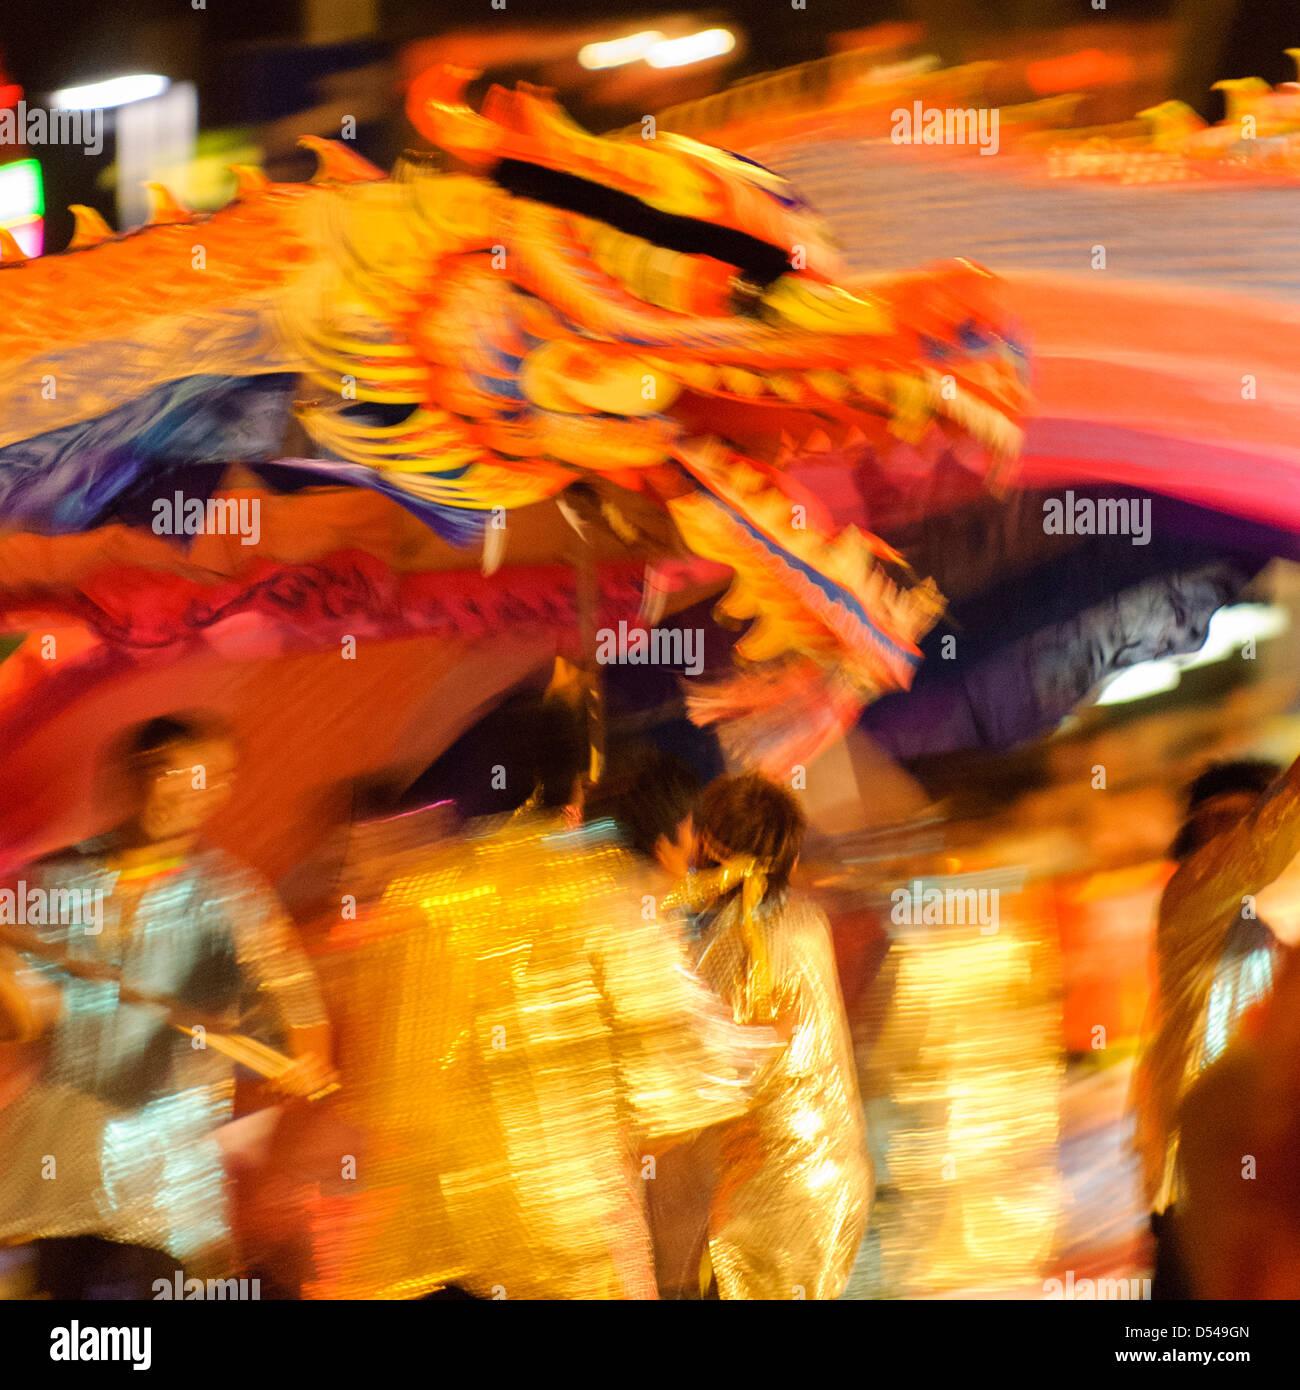 Dragon Dance at Chingay, Singapore - Stock Image